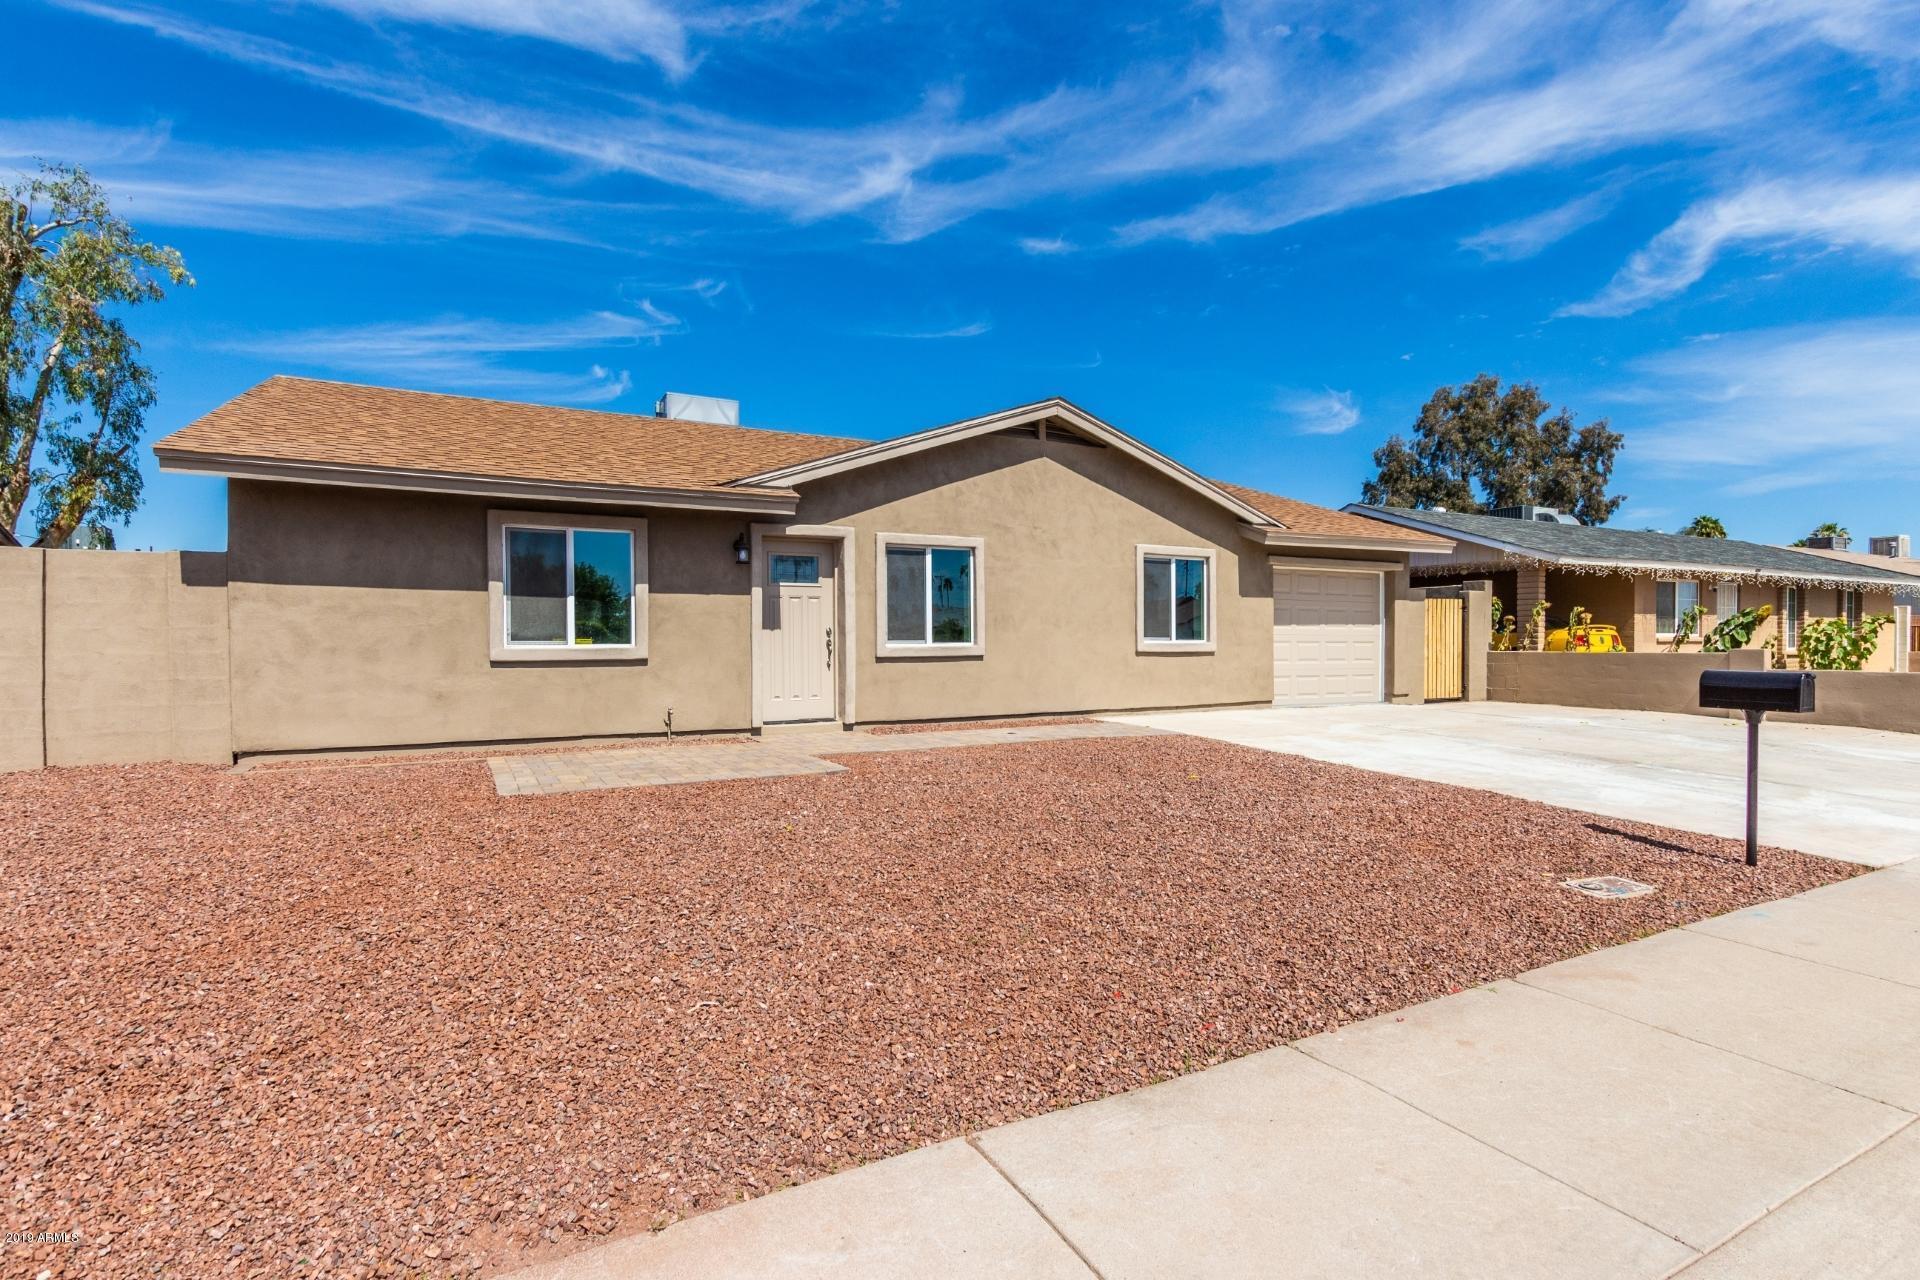 Photo of 7372 W DESERT COVE Avenue, Peoria, AZ 85345